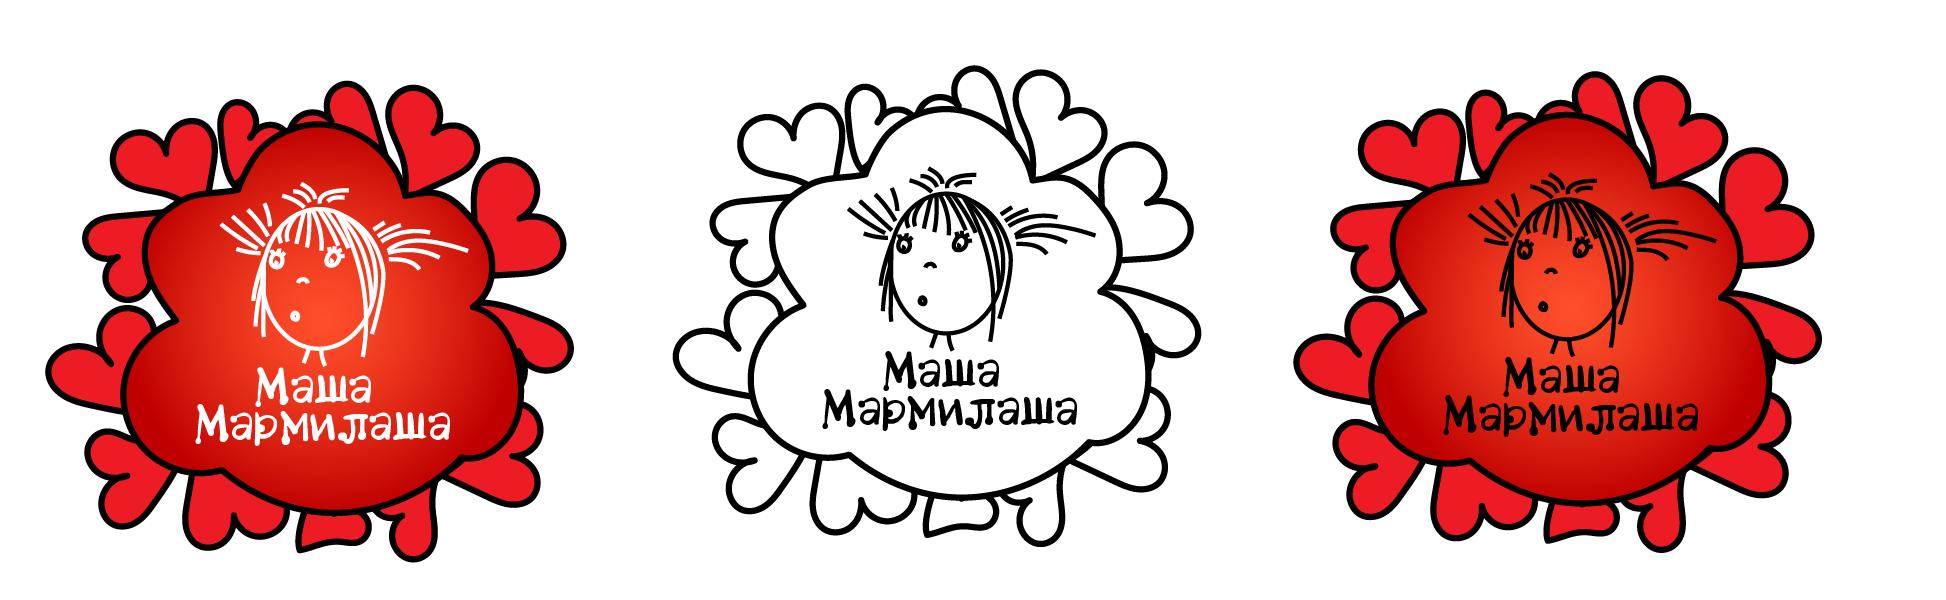 "Логотип для товарного знака ""Милаша-Мармилаша"" фото f_509587b9678d71c4.png"